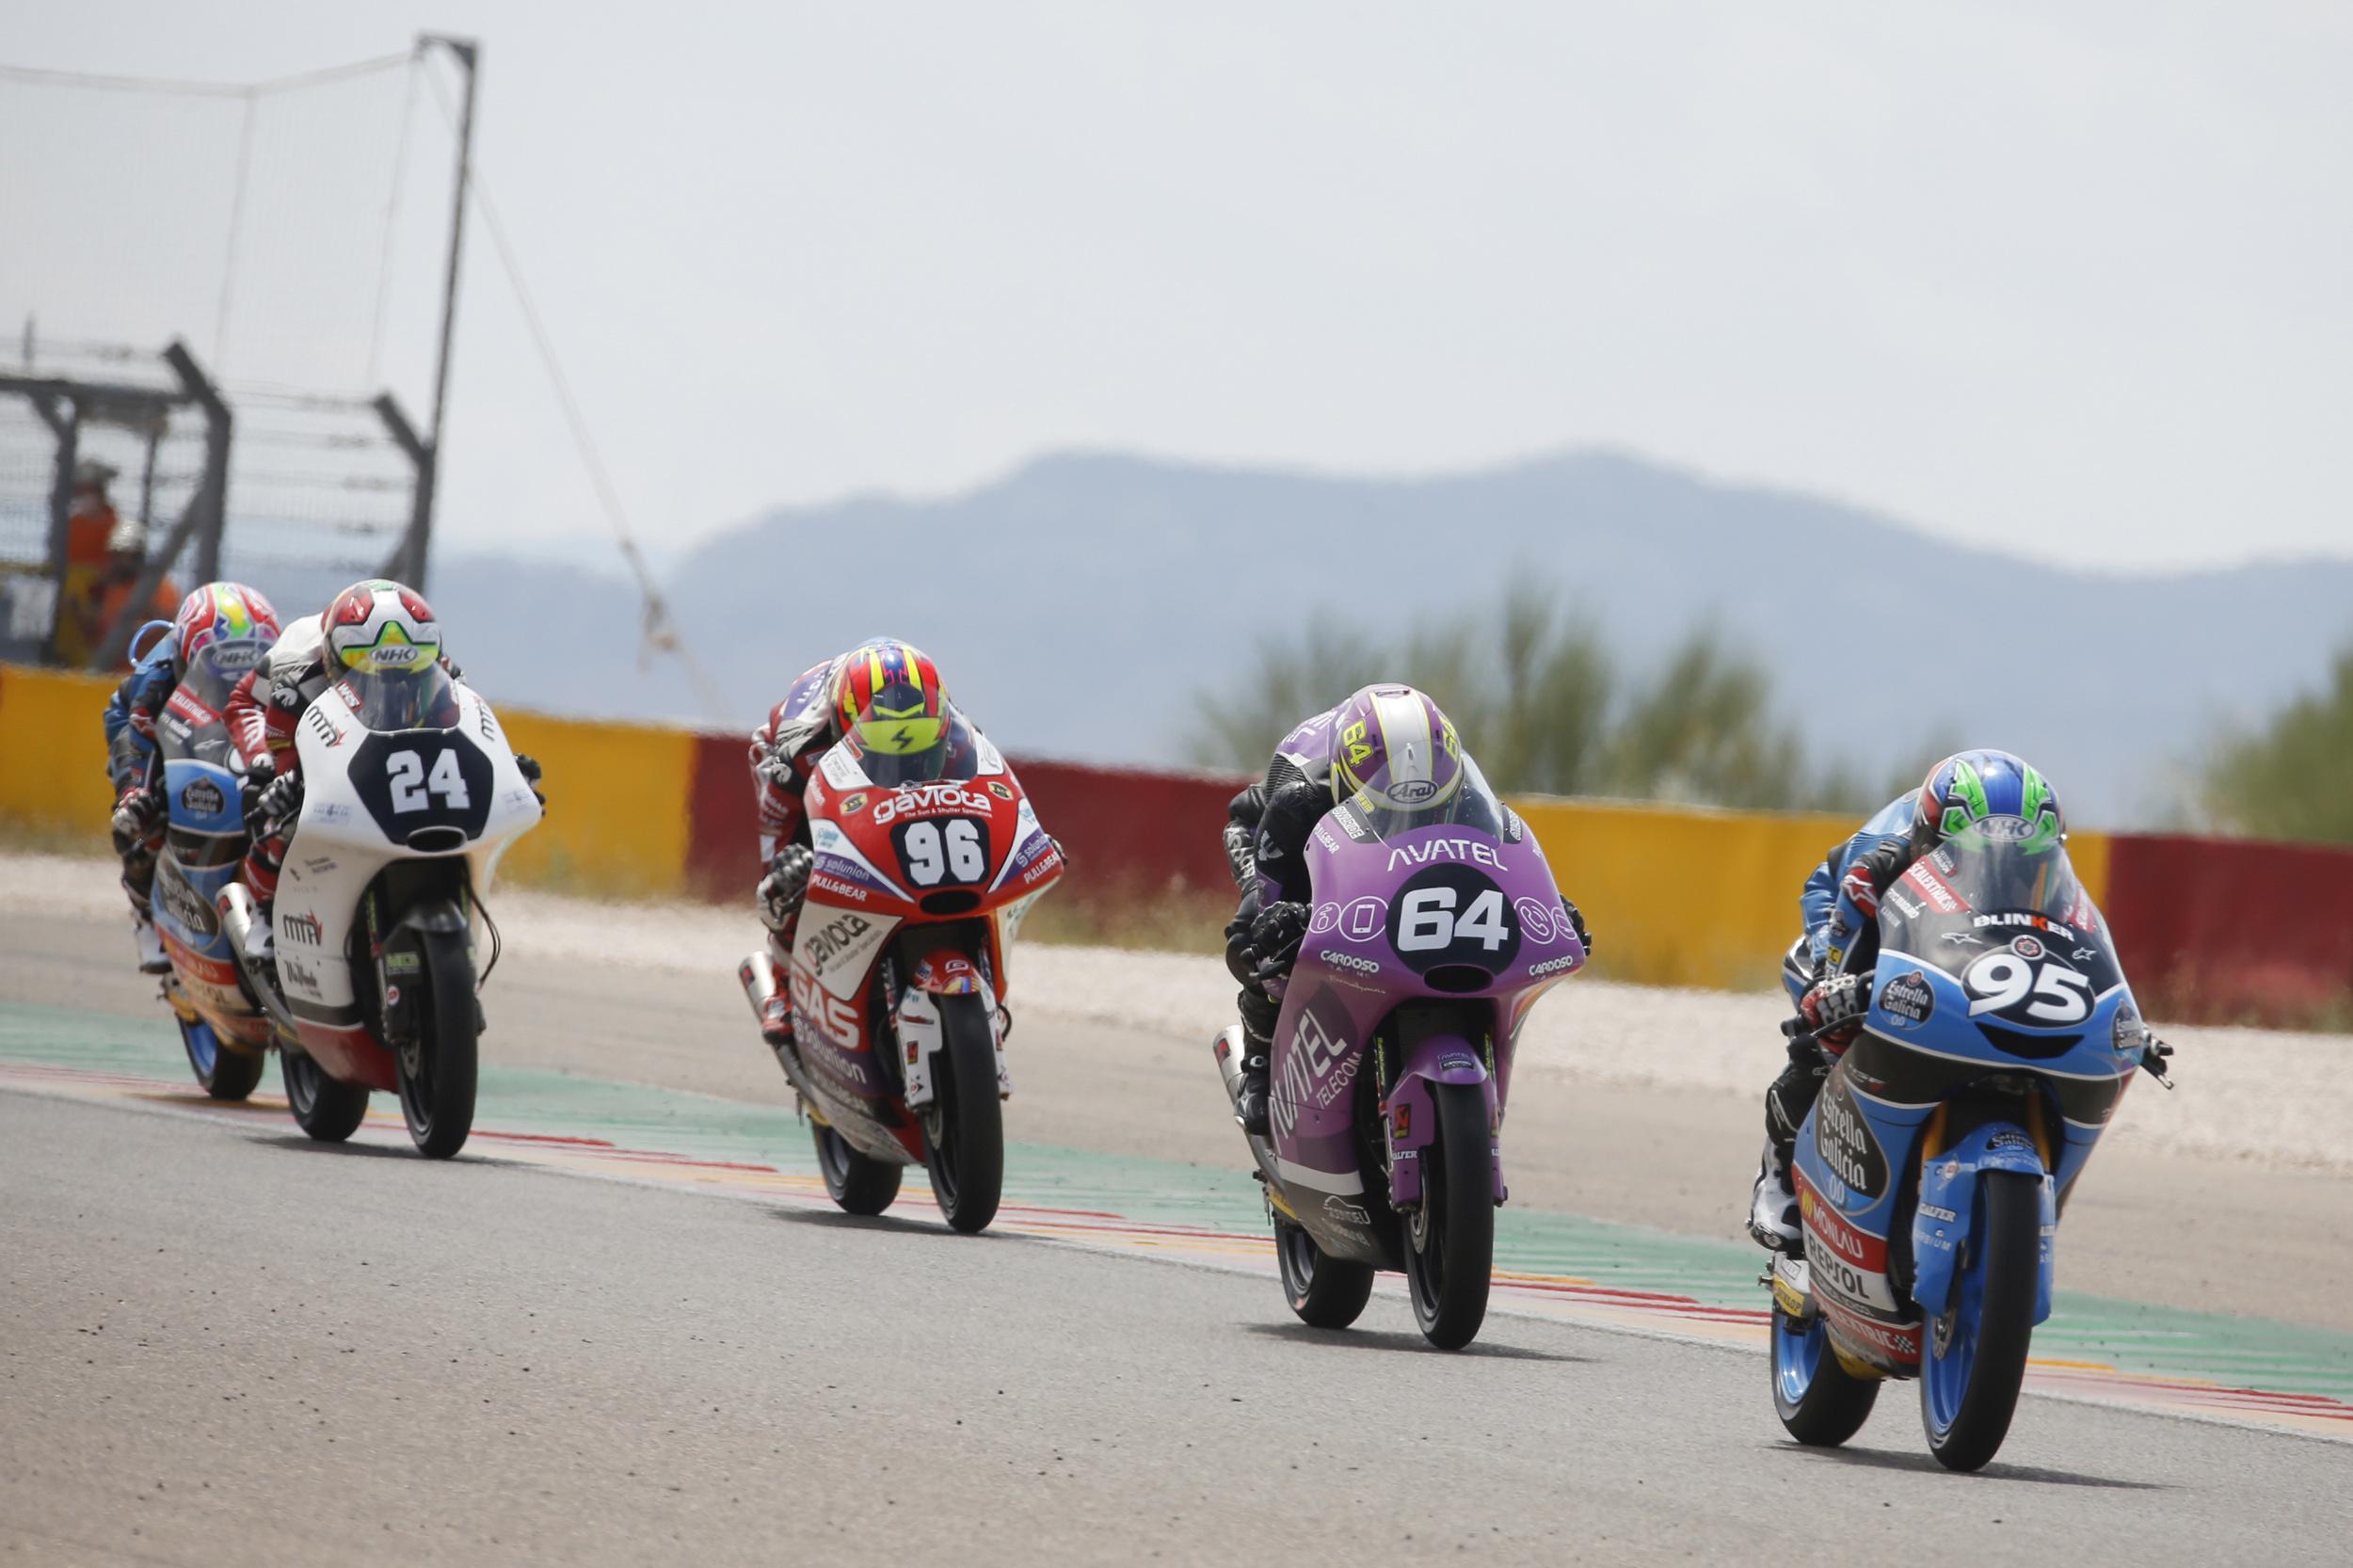 Moto3 Junior FIM CEV Repsol - Motorland Aragón - José Antonio Rueda, David Muñoz, Daniel Holgado, Iván Ortolá